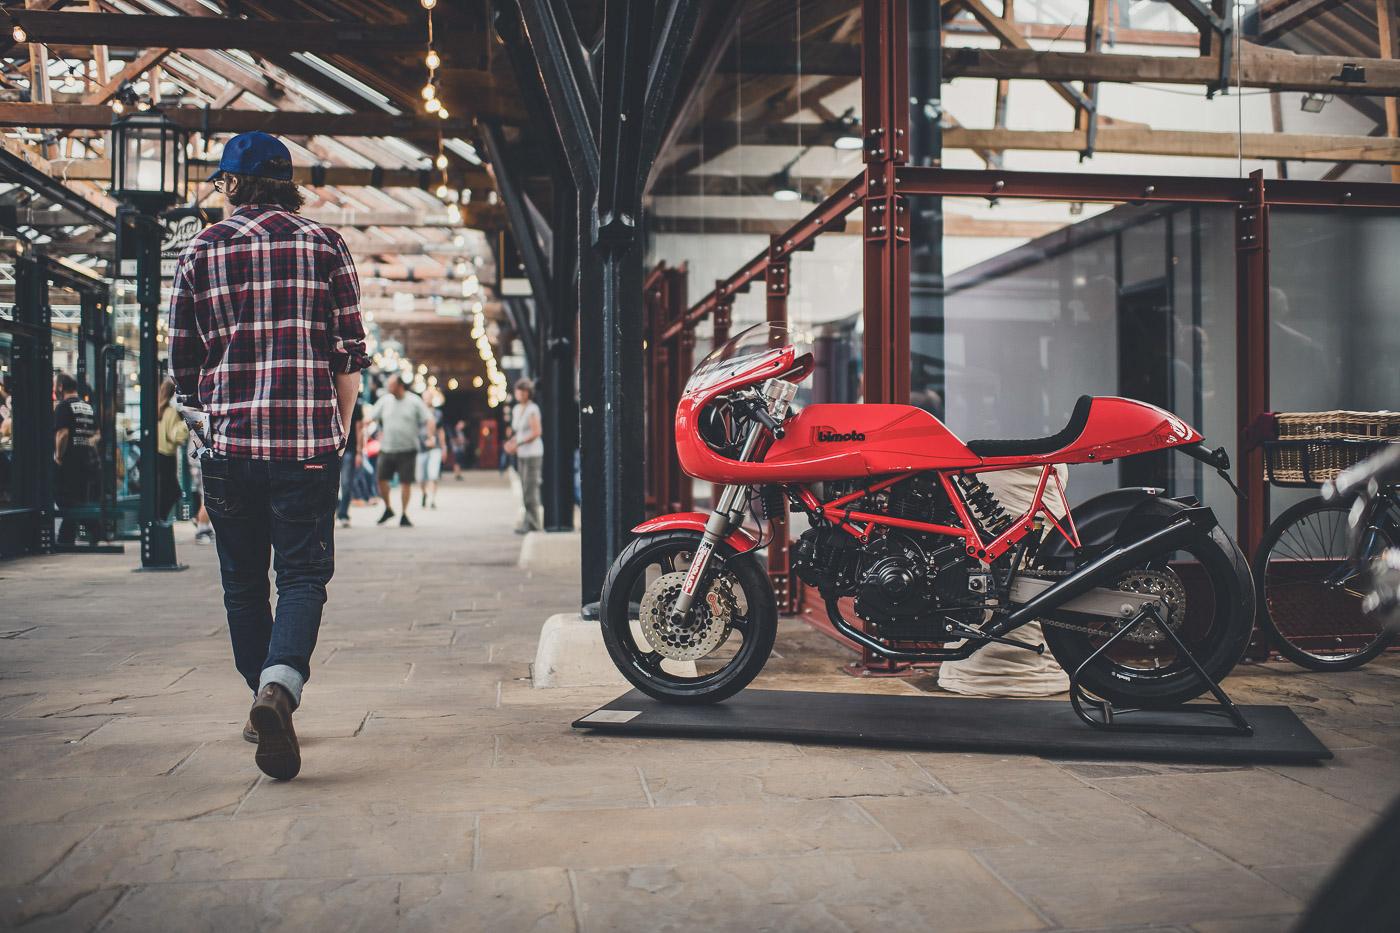 Bike-Shed-London-2018-Amy-Shore-Selects-web-low-78.jpg